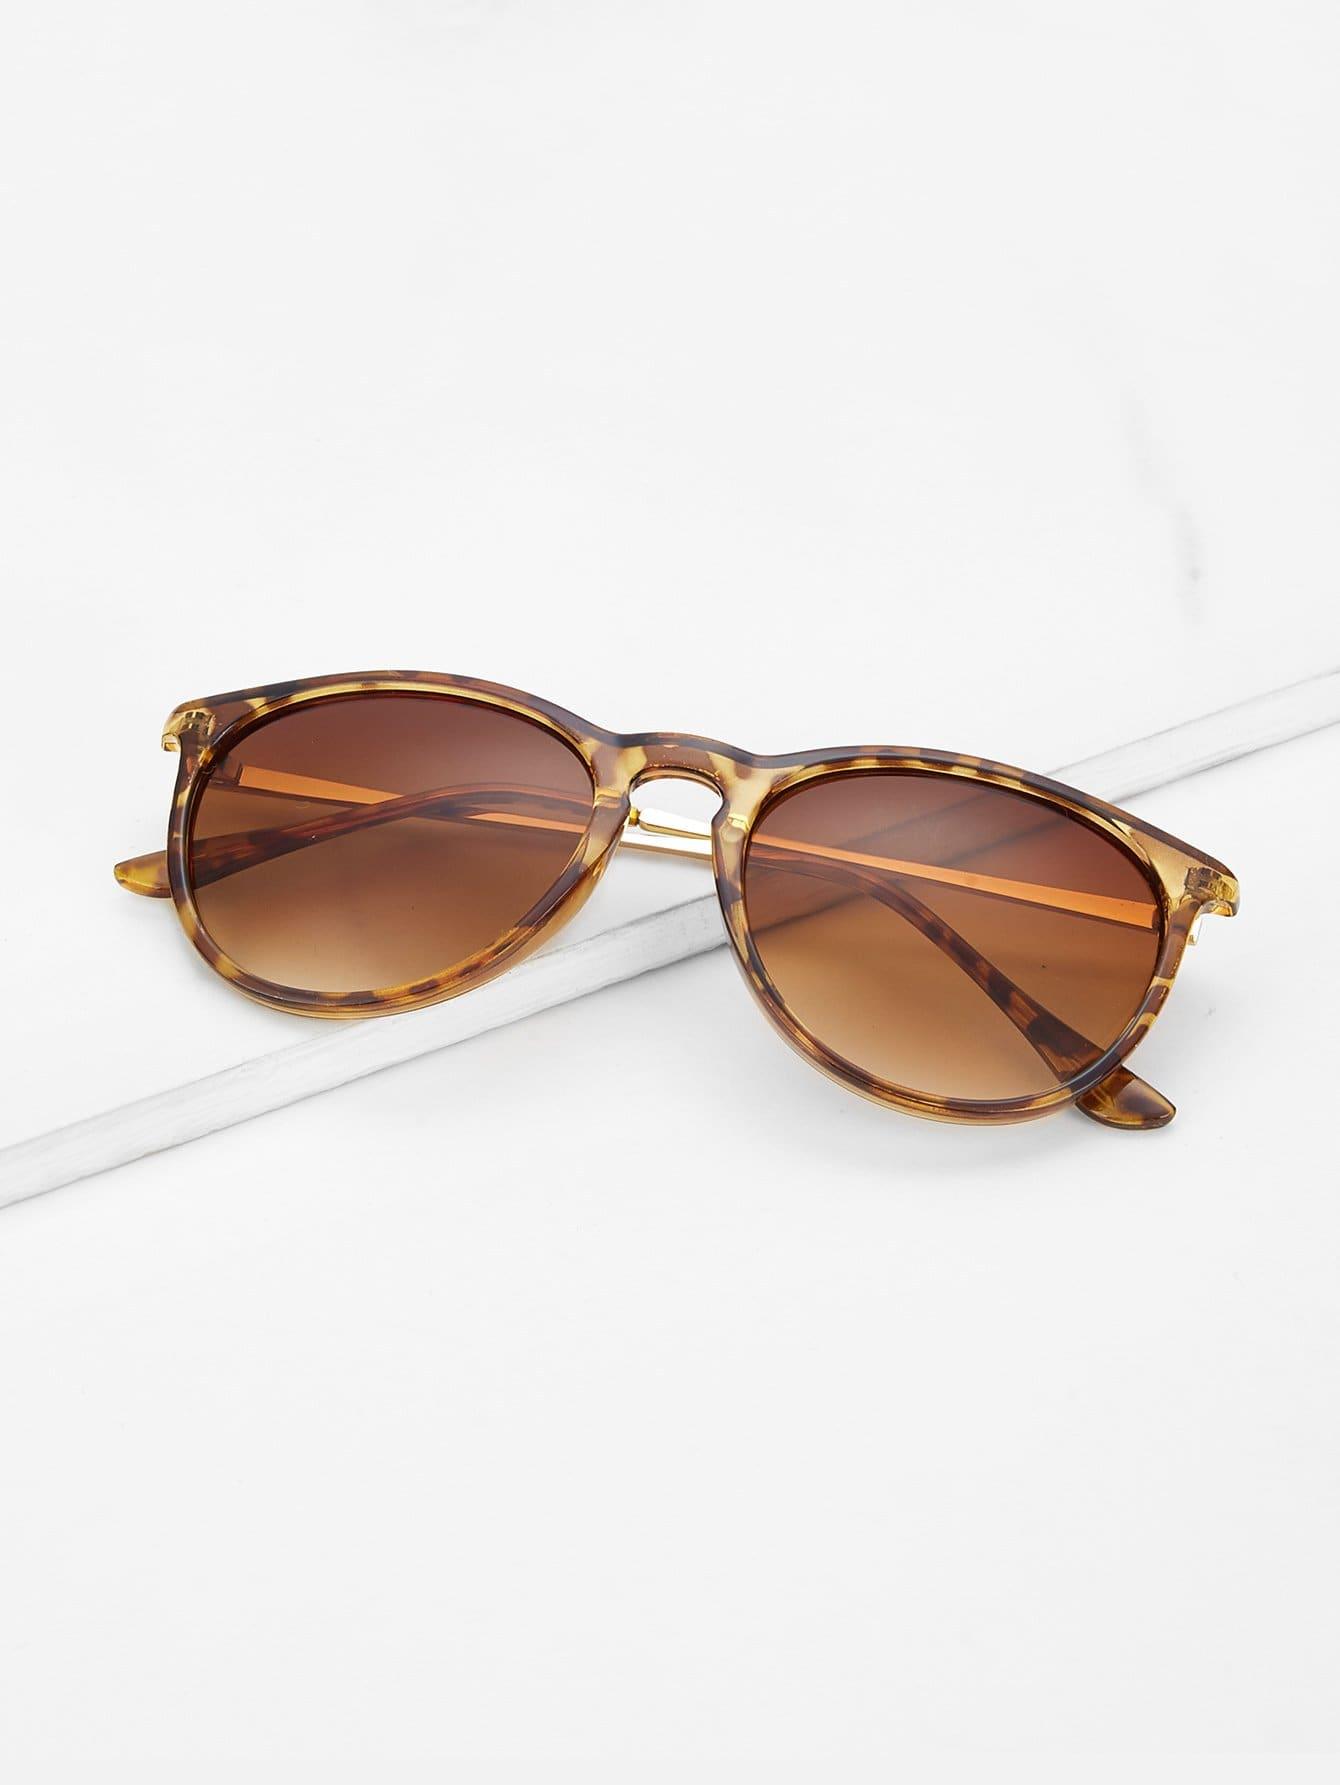 Leopard Frame Flat Lens Sunglasses chic alloy crossbar flat lens cool leopard sunglasses for women